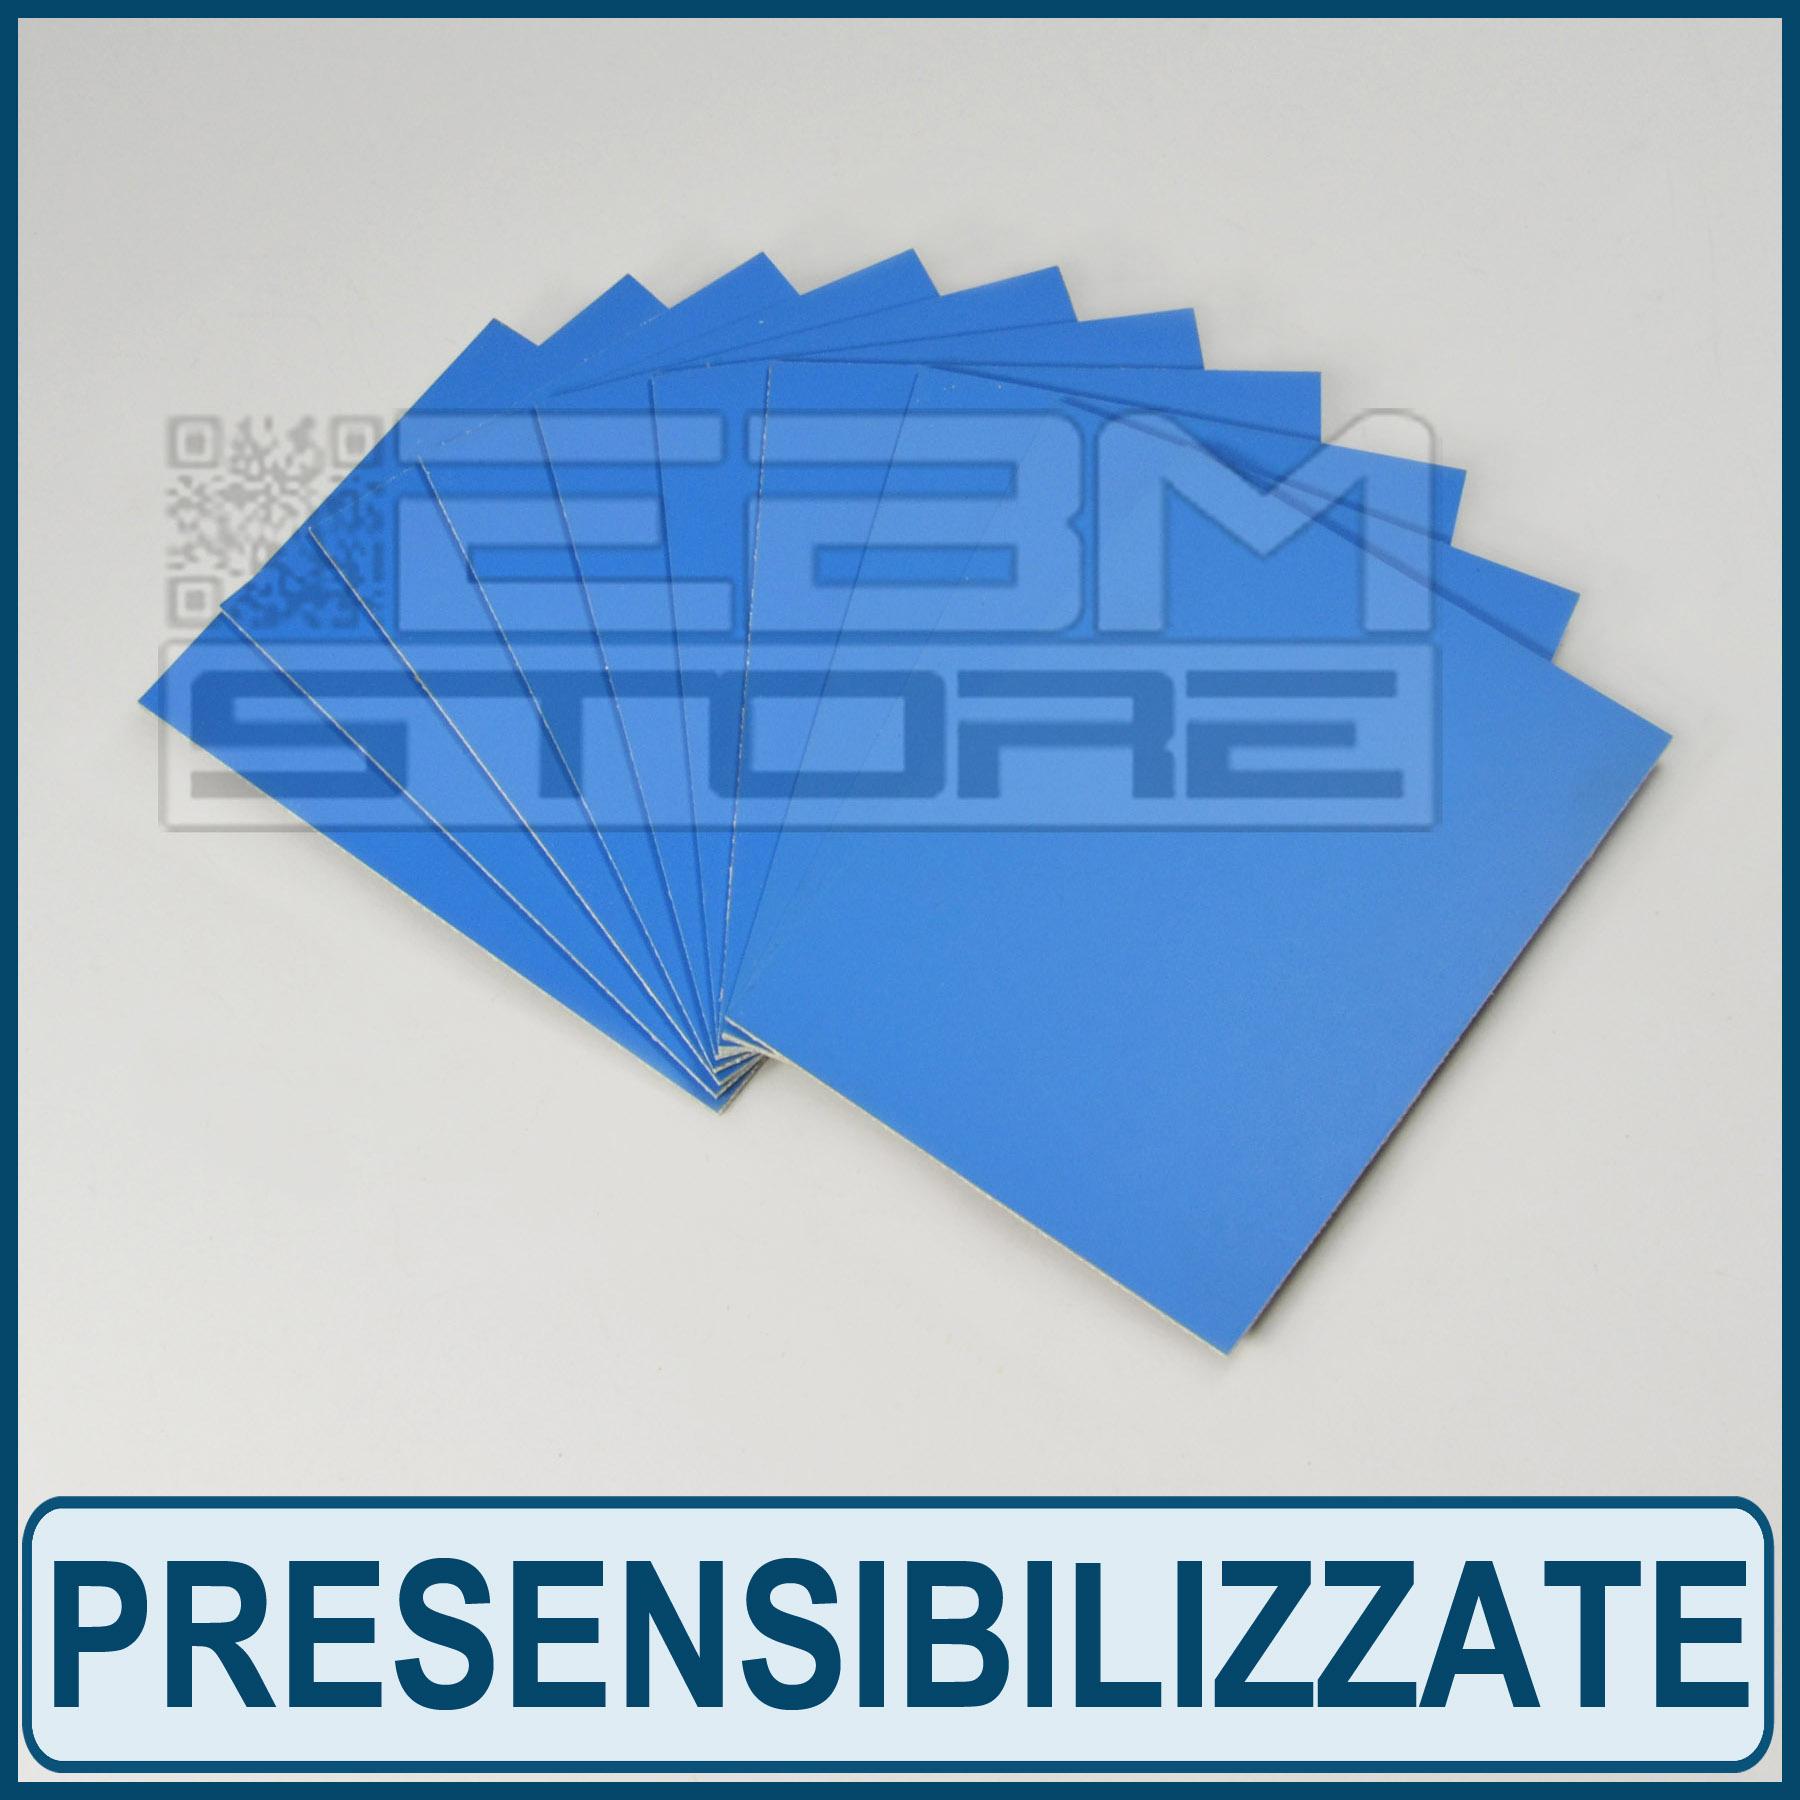 Set 4 Pz Basetta Millefori Vetronite Doppia Faccia Art An01 Ebay Soldering Prototype Copper Pcb Printed Circuit Board 70x90mm 2 P